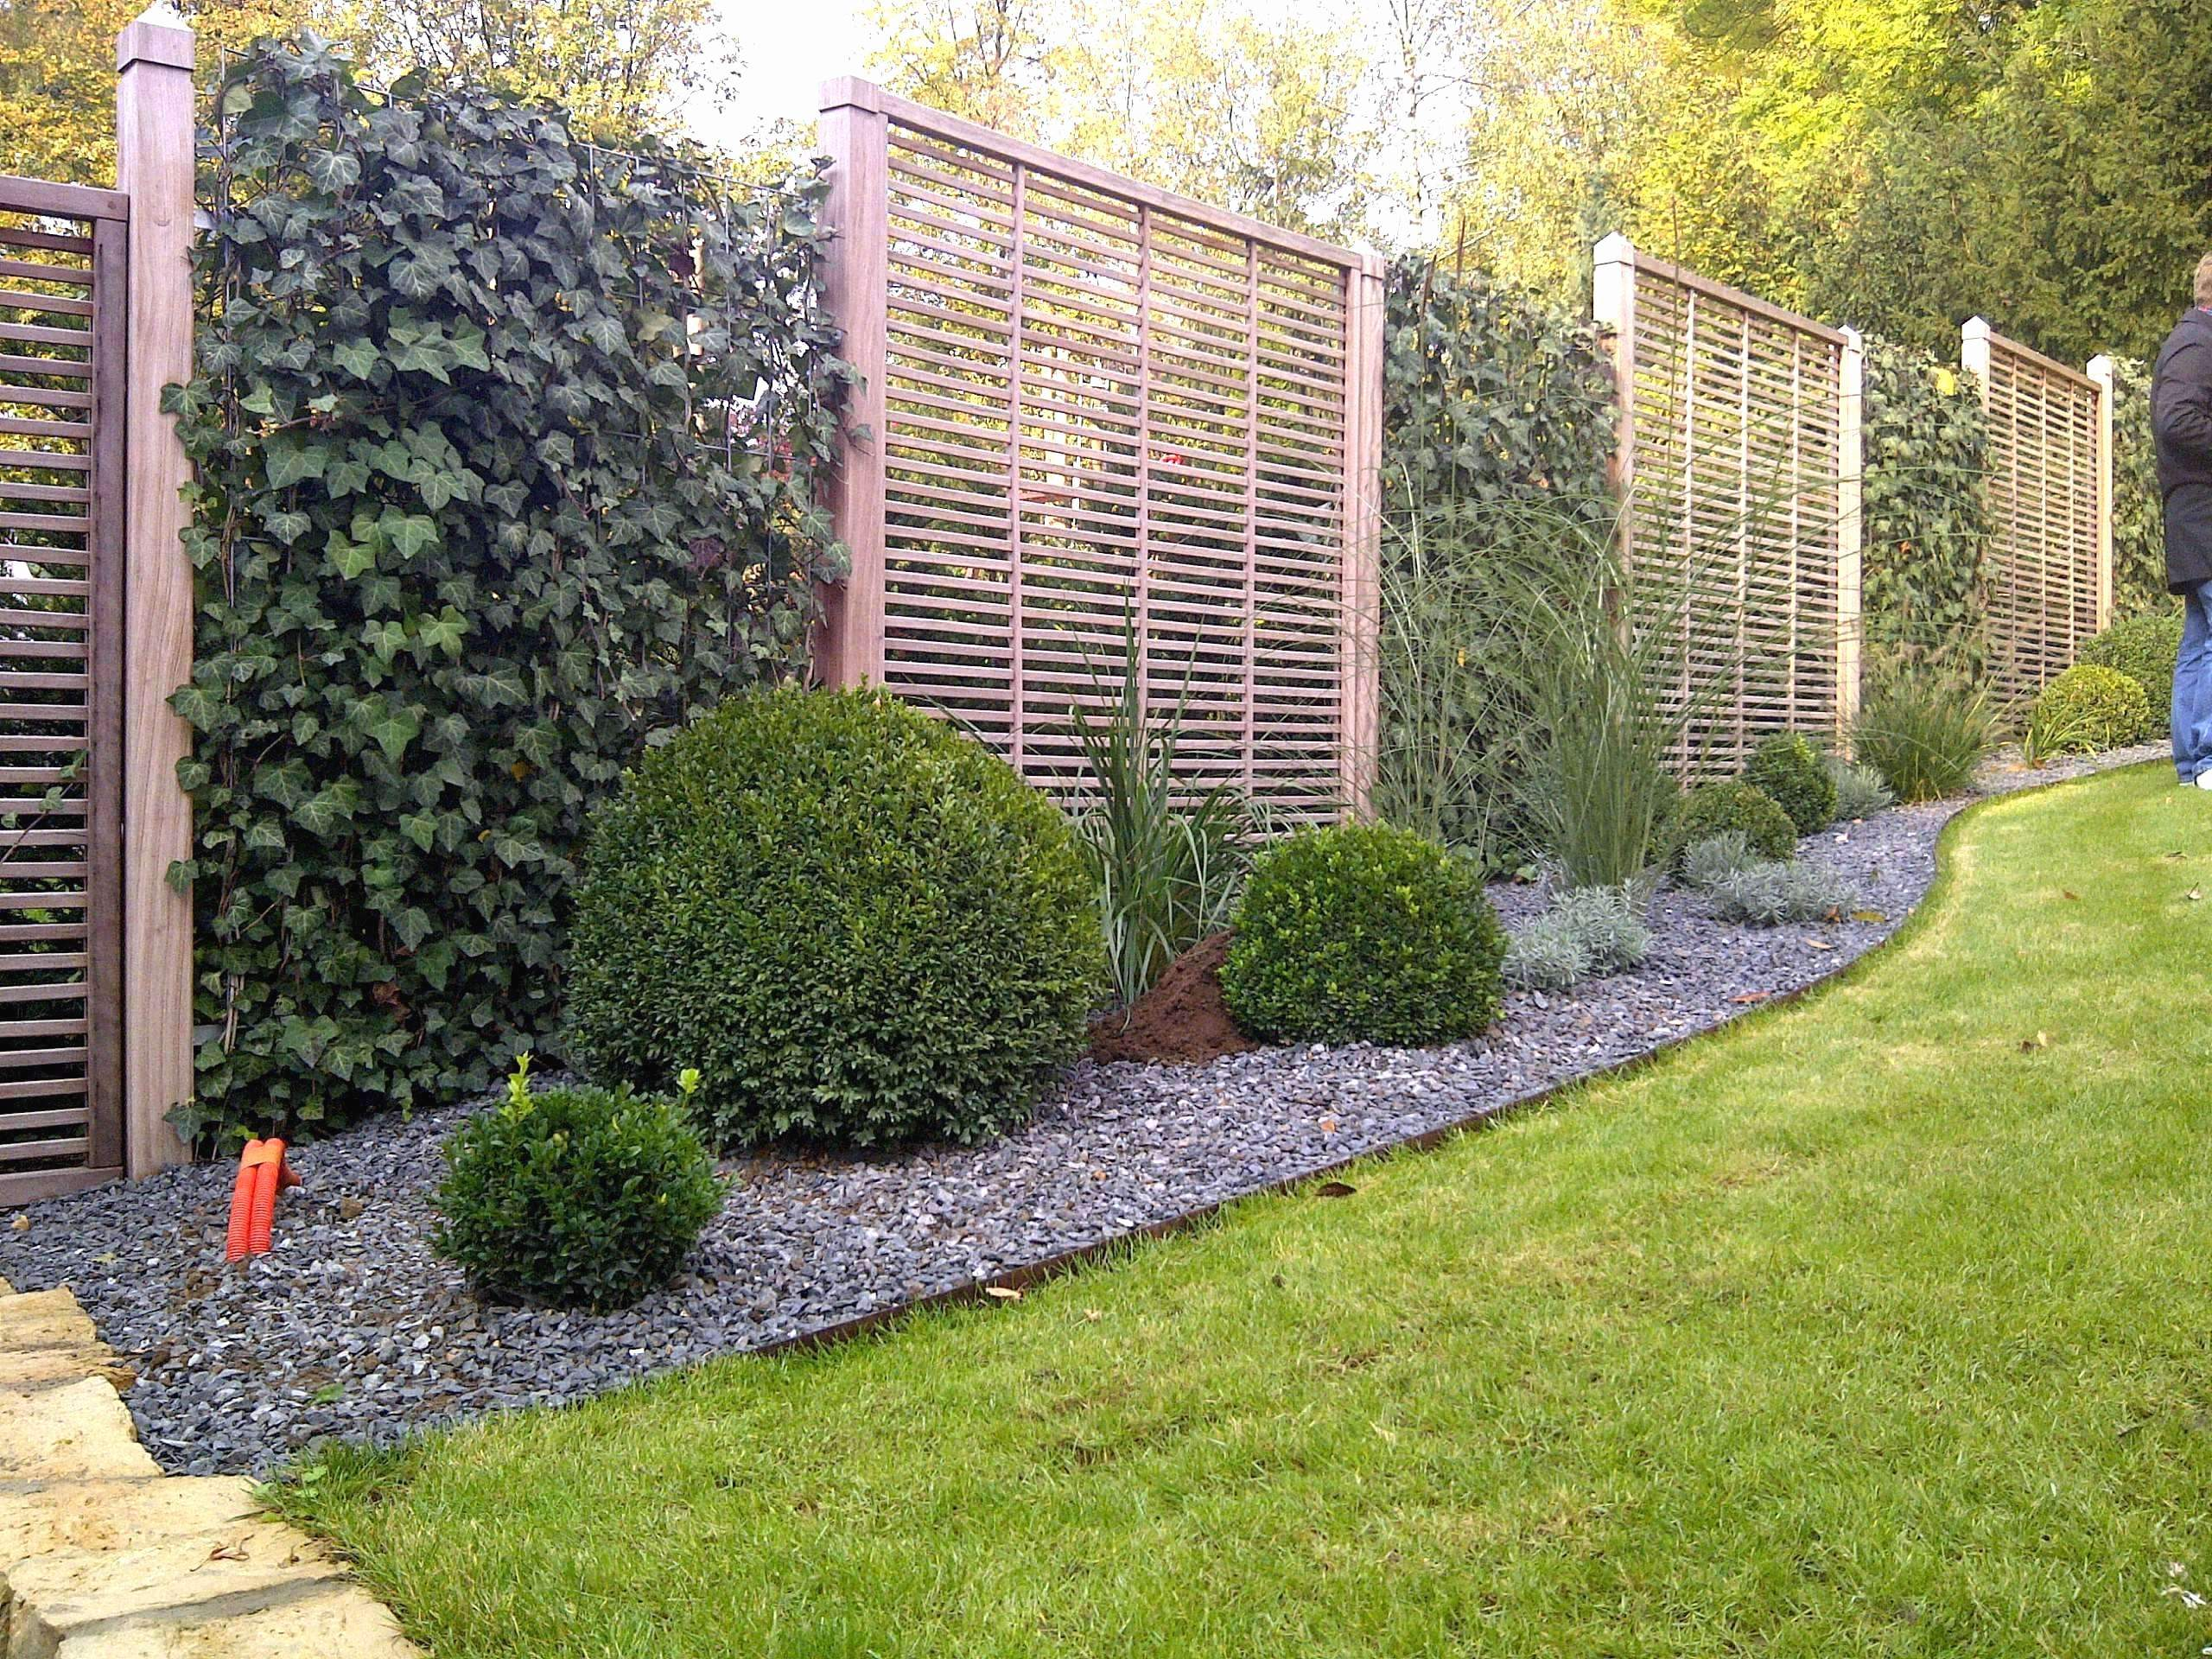 Sitzecke Garten Ideen Luxus 29 Genial Garten Sitzecke Inspirierend